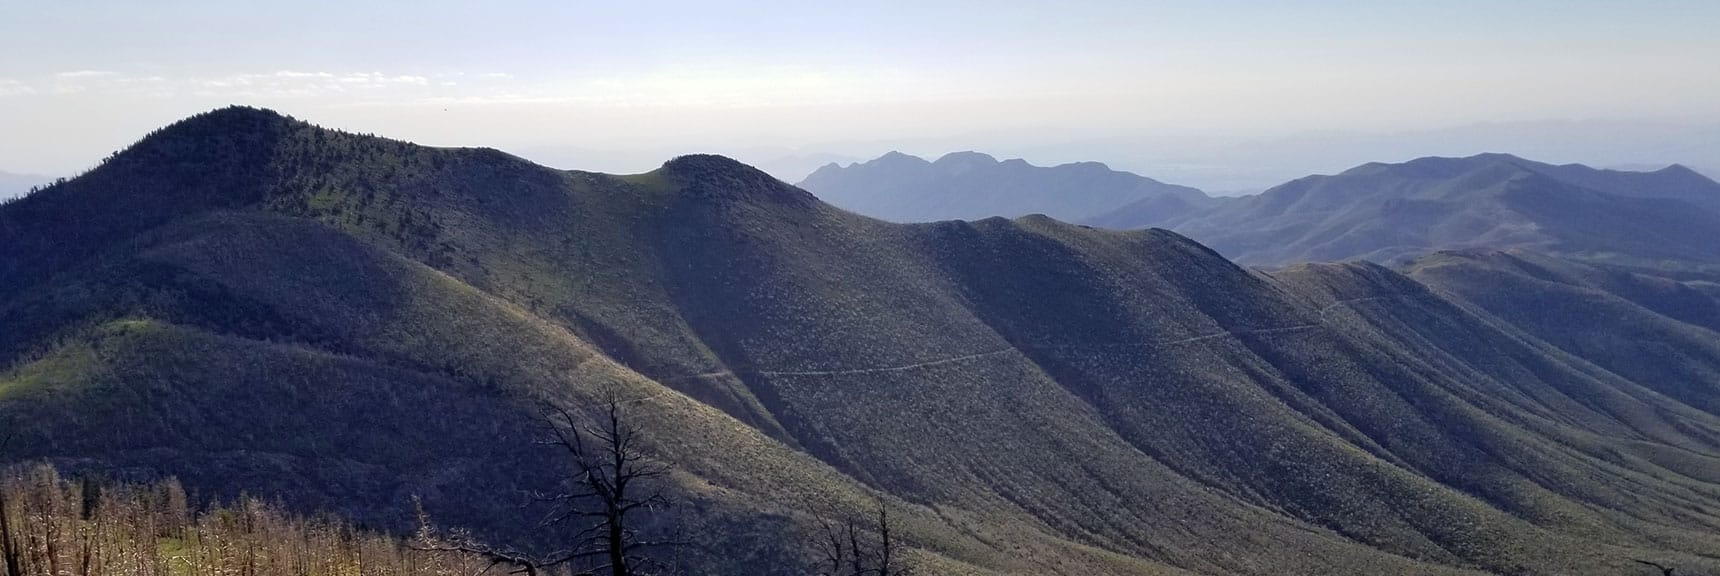 Harris Mountain, Ridge and Main Trail from Harris Springs Rd.